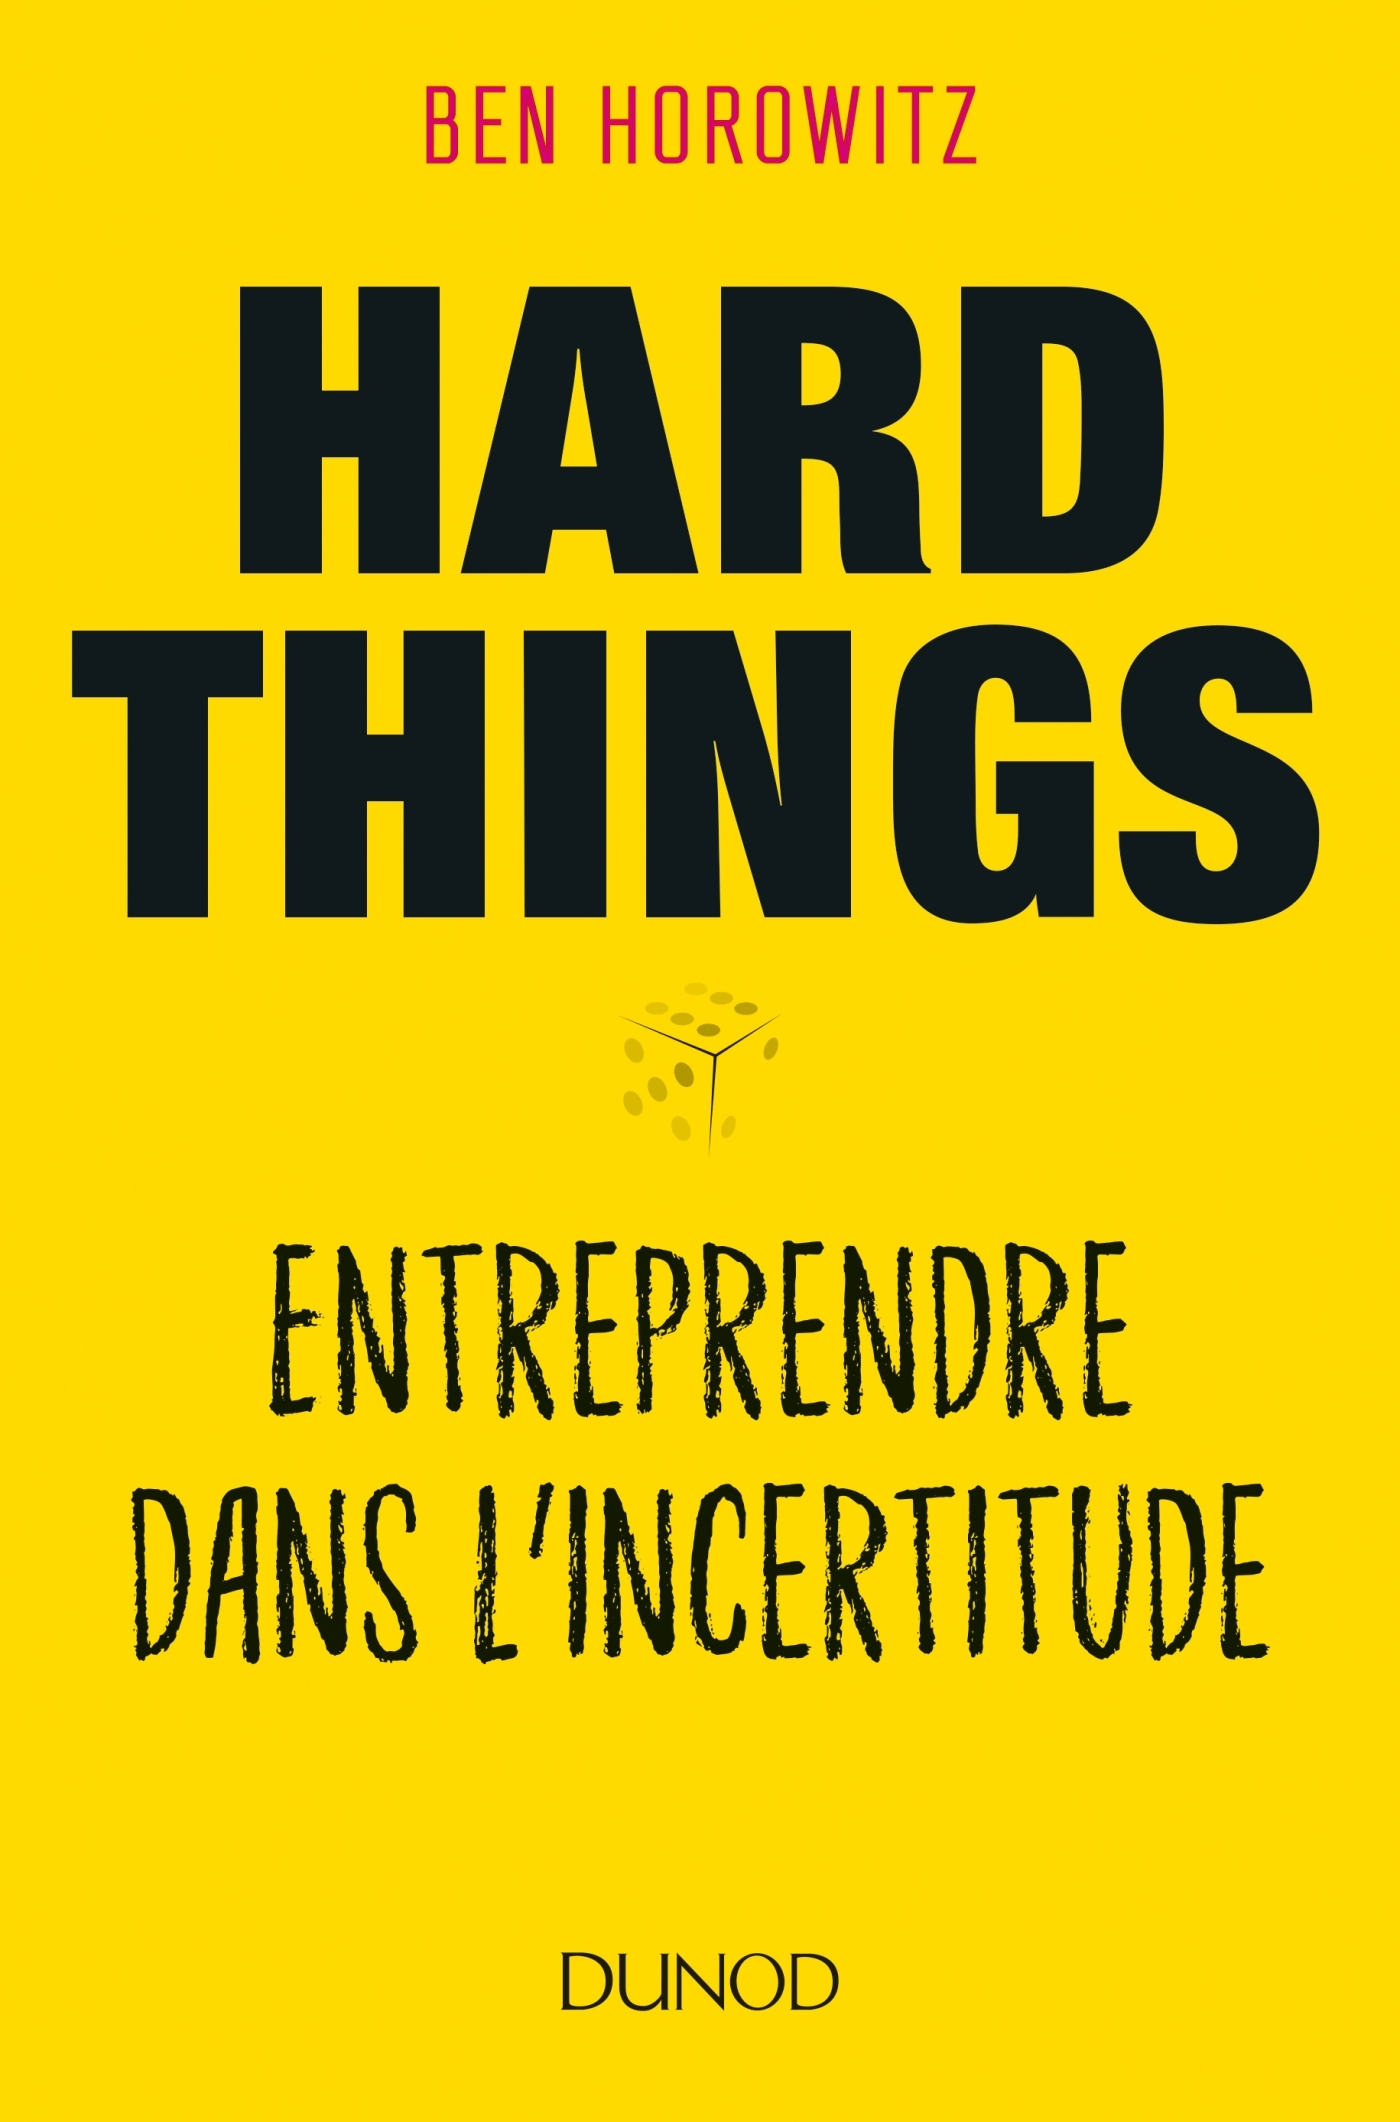 HARD THINGS - ENTREPRENDRE DANS L'INCERTITUDE